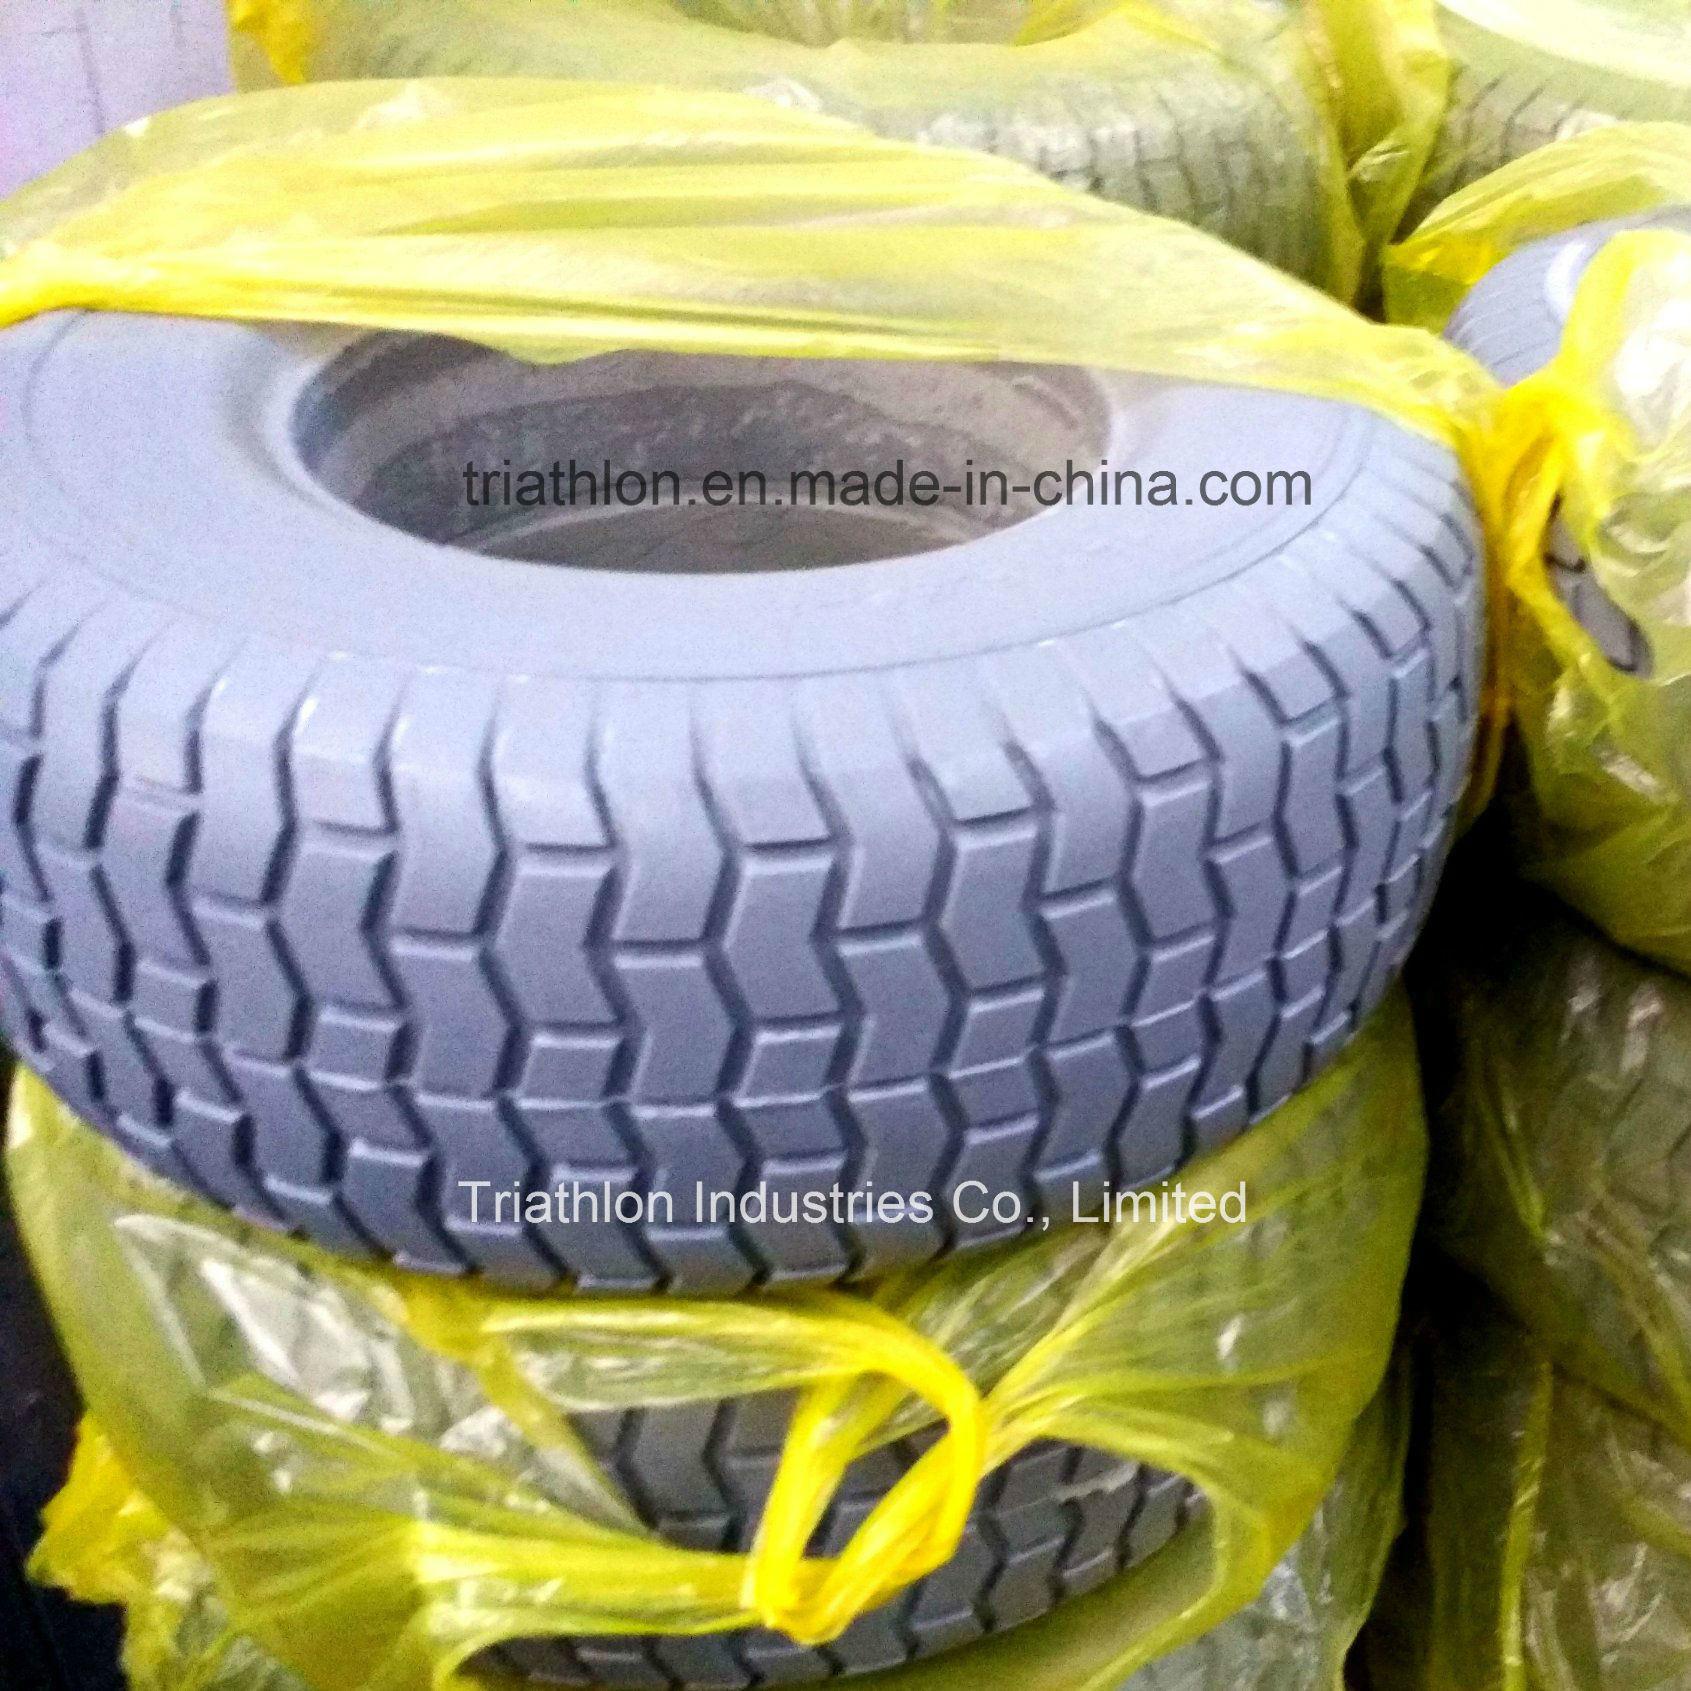 16X6.50-8 Narrow Turf Flat Free Garden Tractor Tires